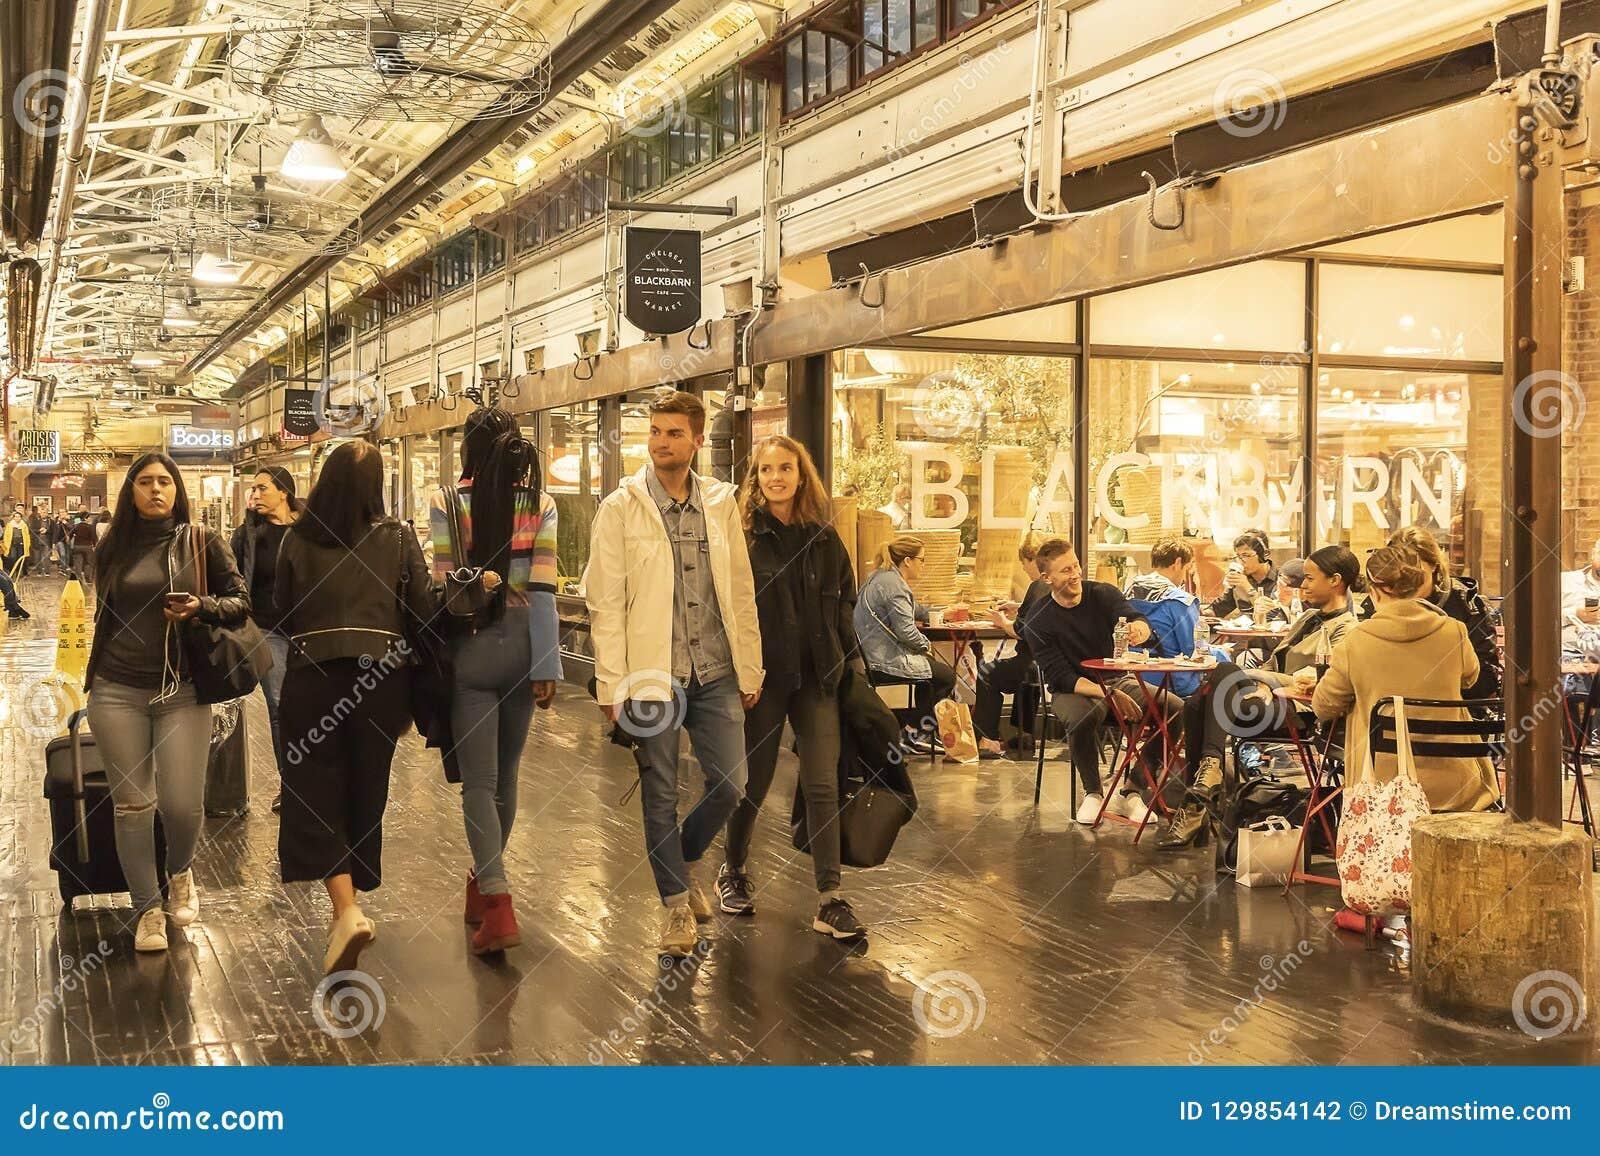 Chelsea Market New York City Usa 14 May 2018 Customers